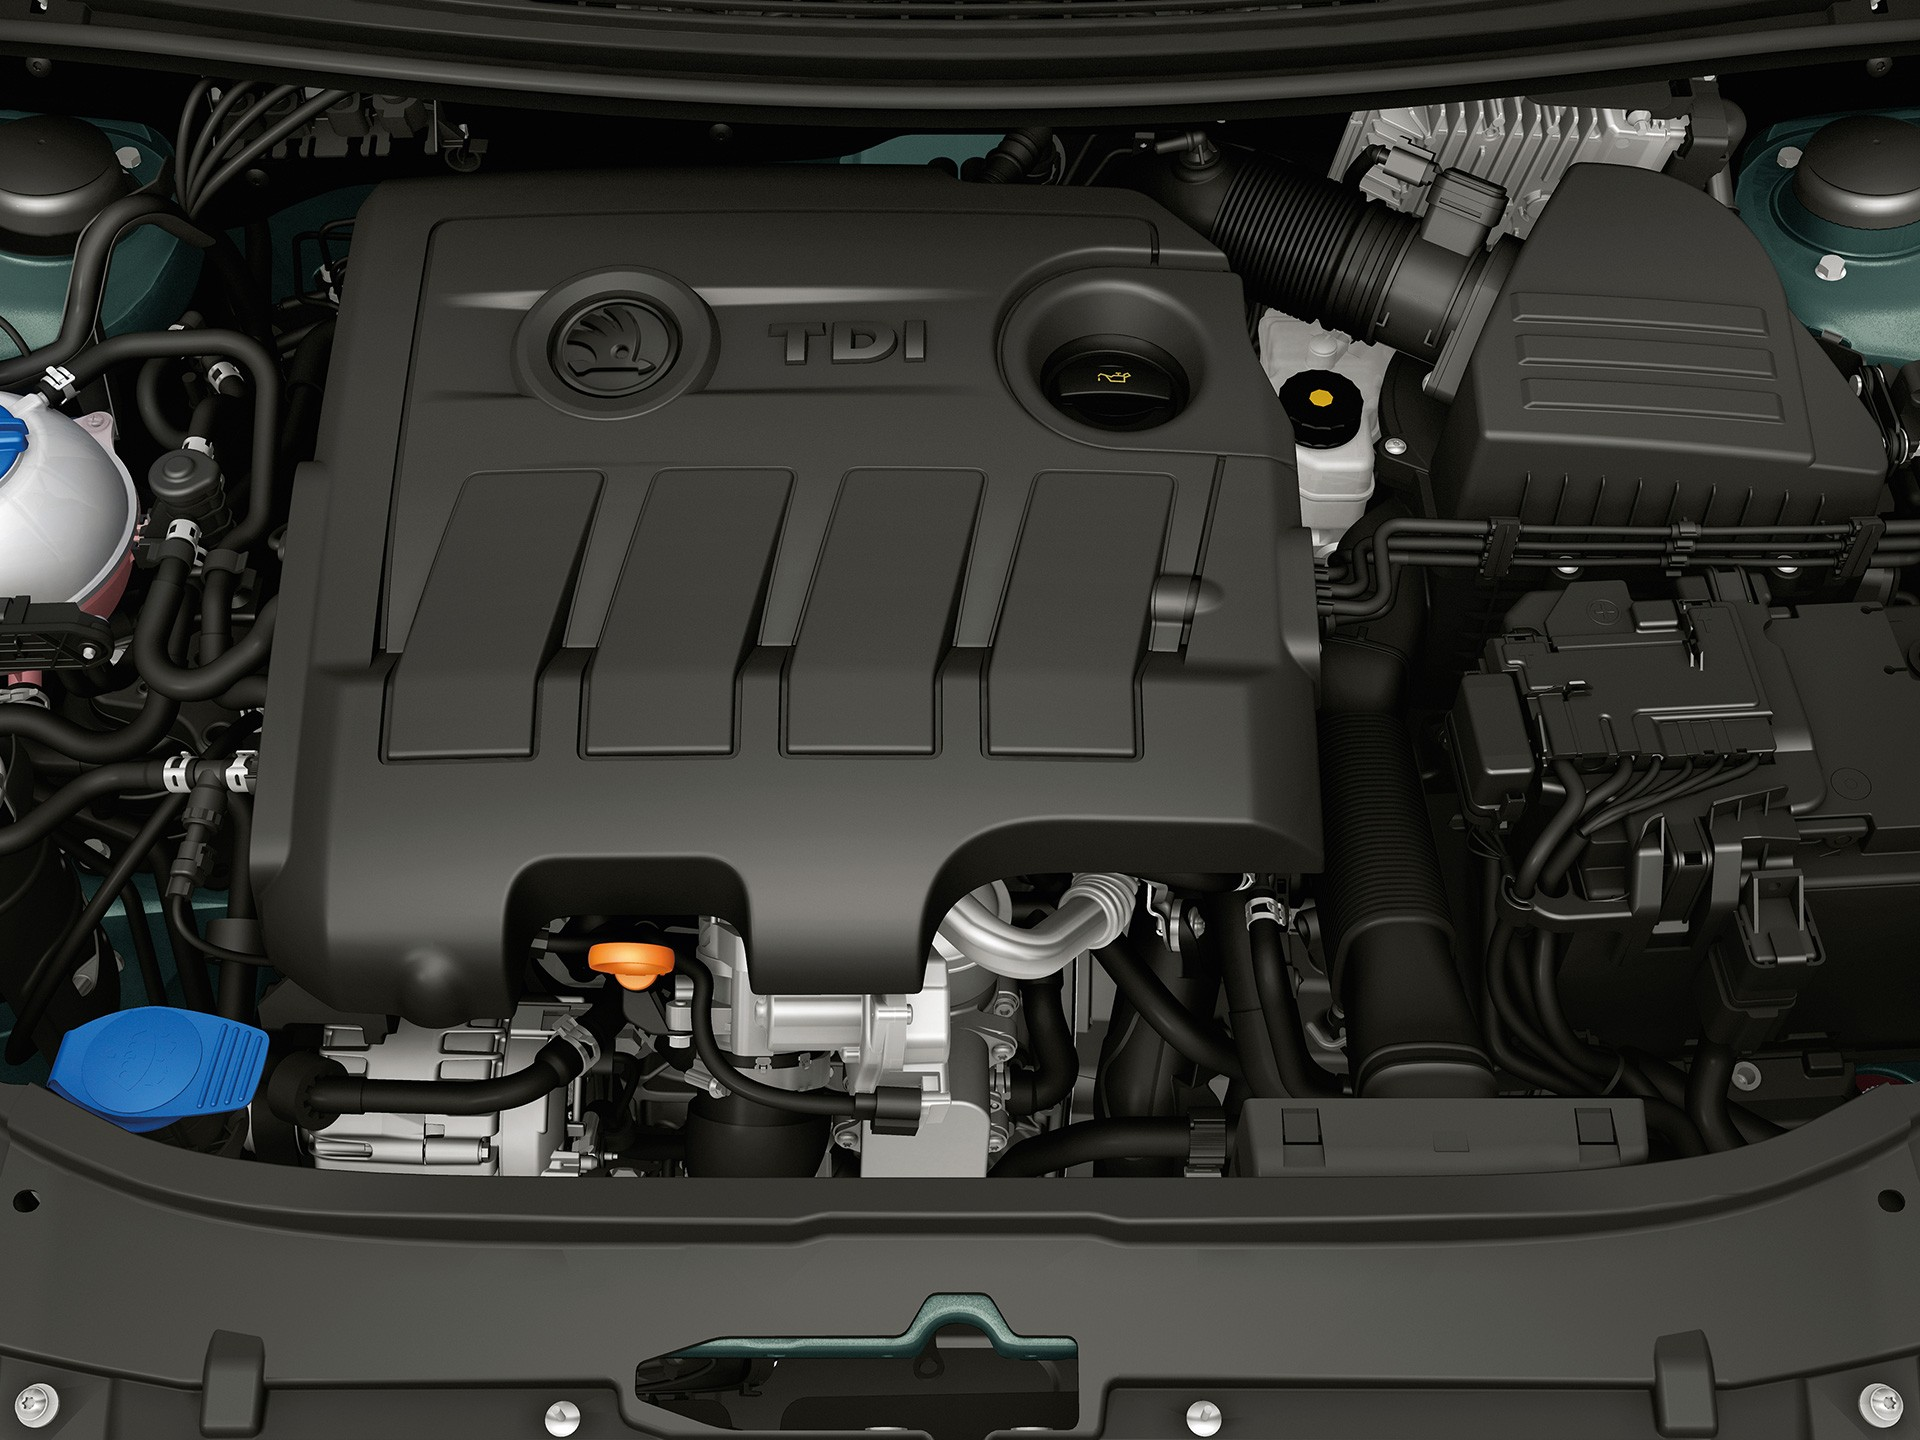 Характеристика двигателя шкода октавия 3 27 фотография